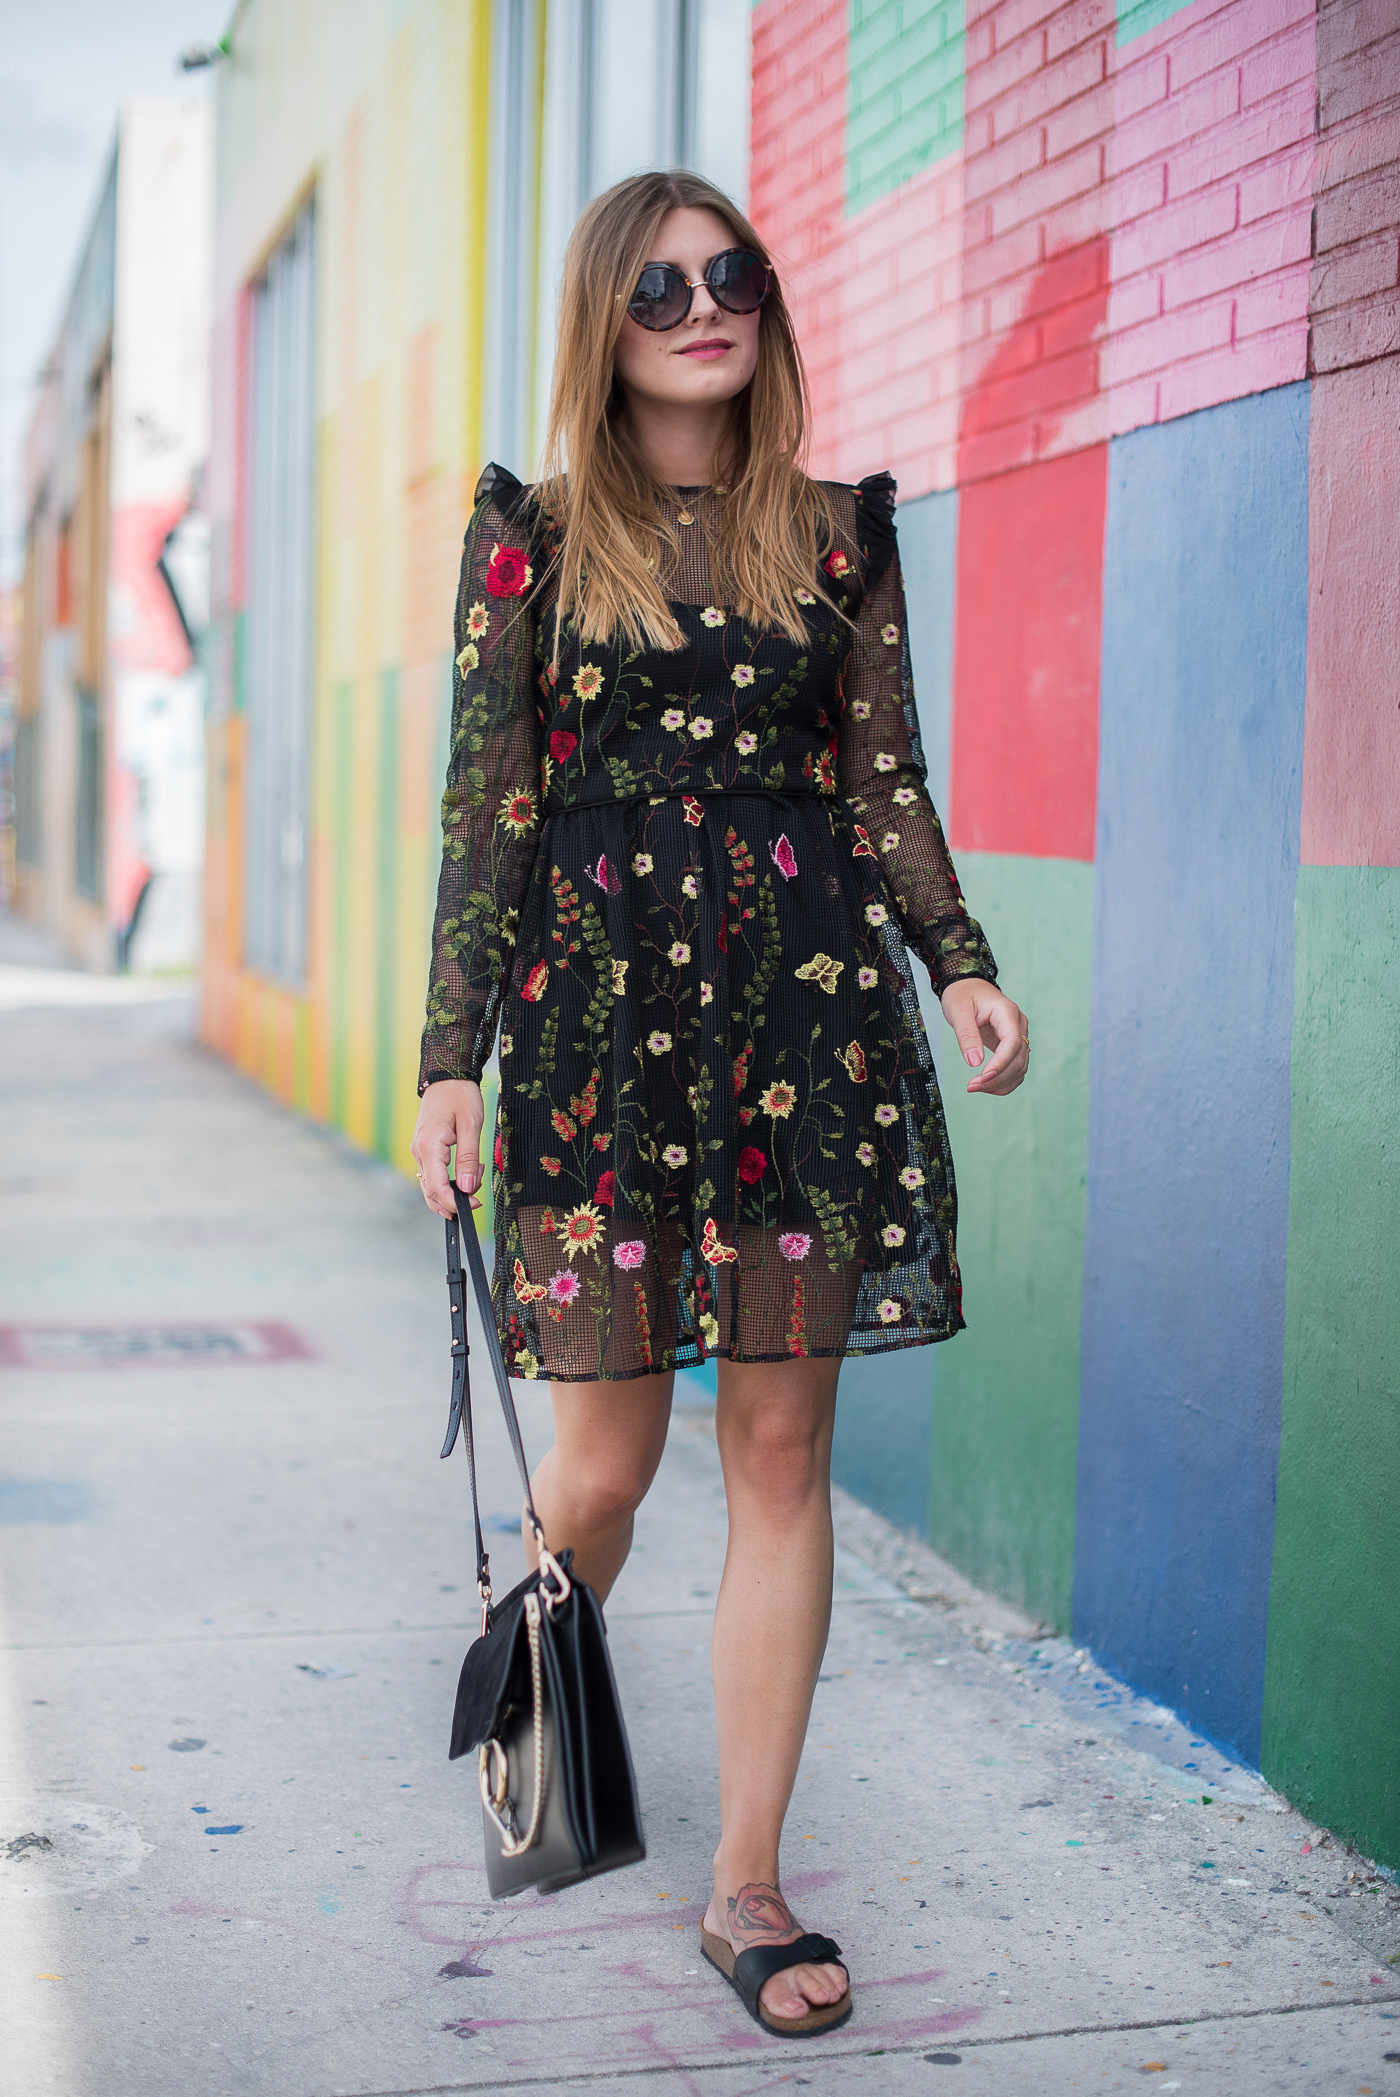 miami_wynwood_walls_flower_print_dress_1